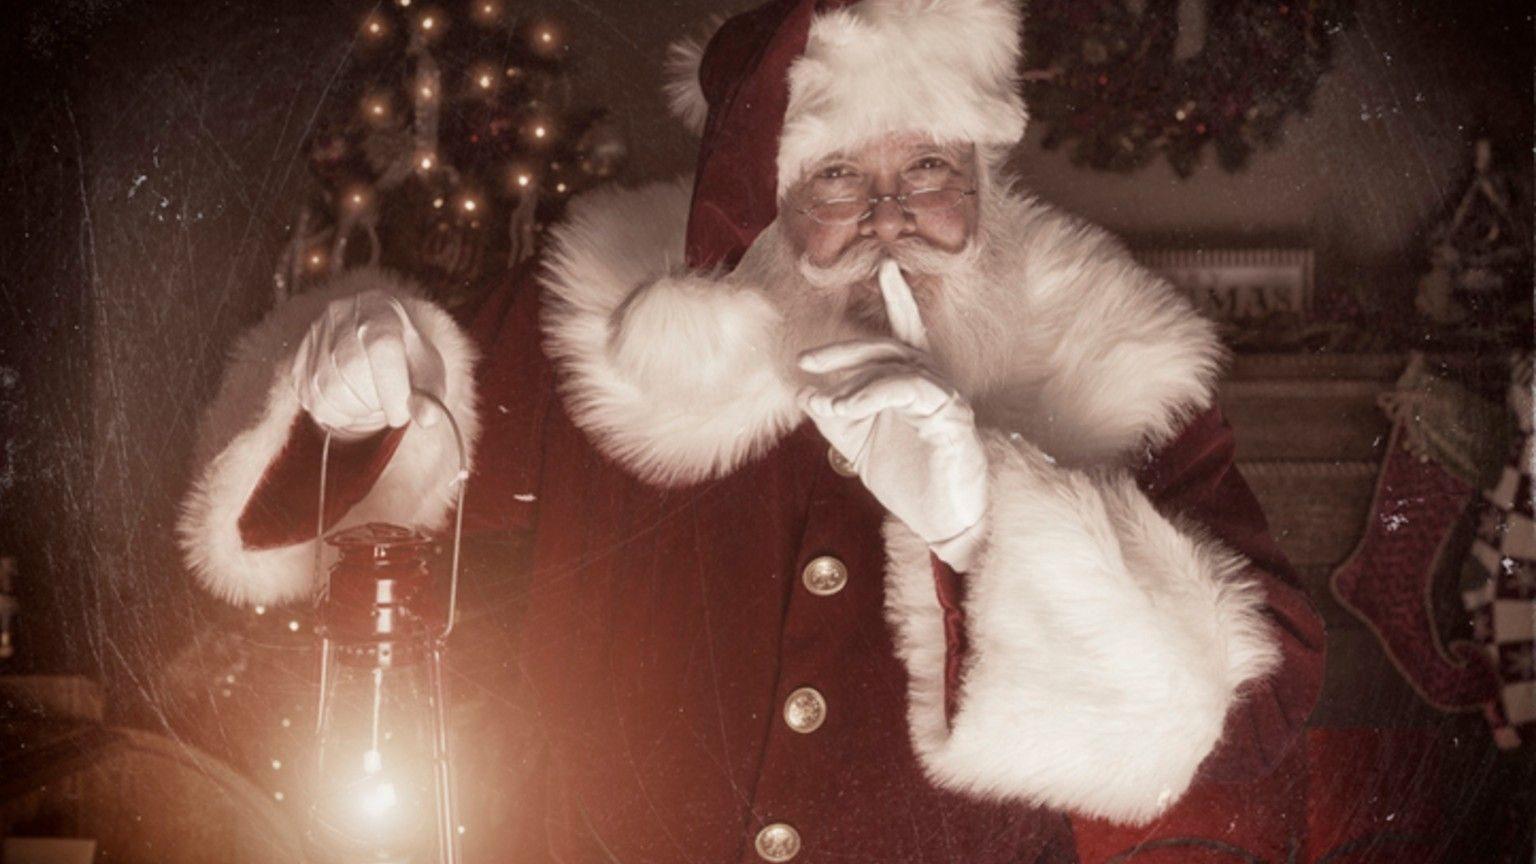 Santa shooshing